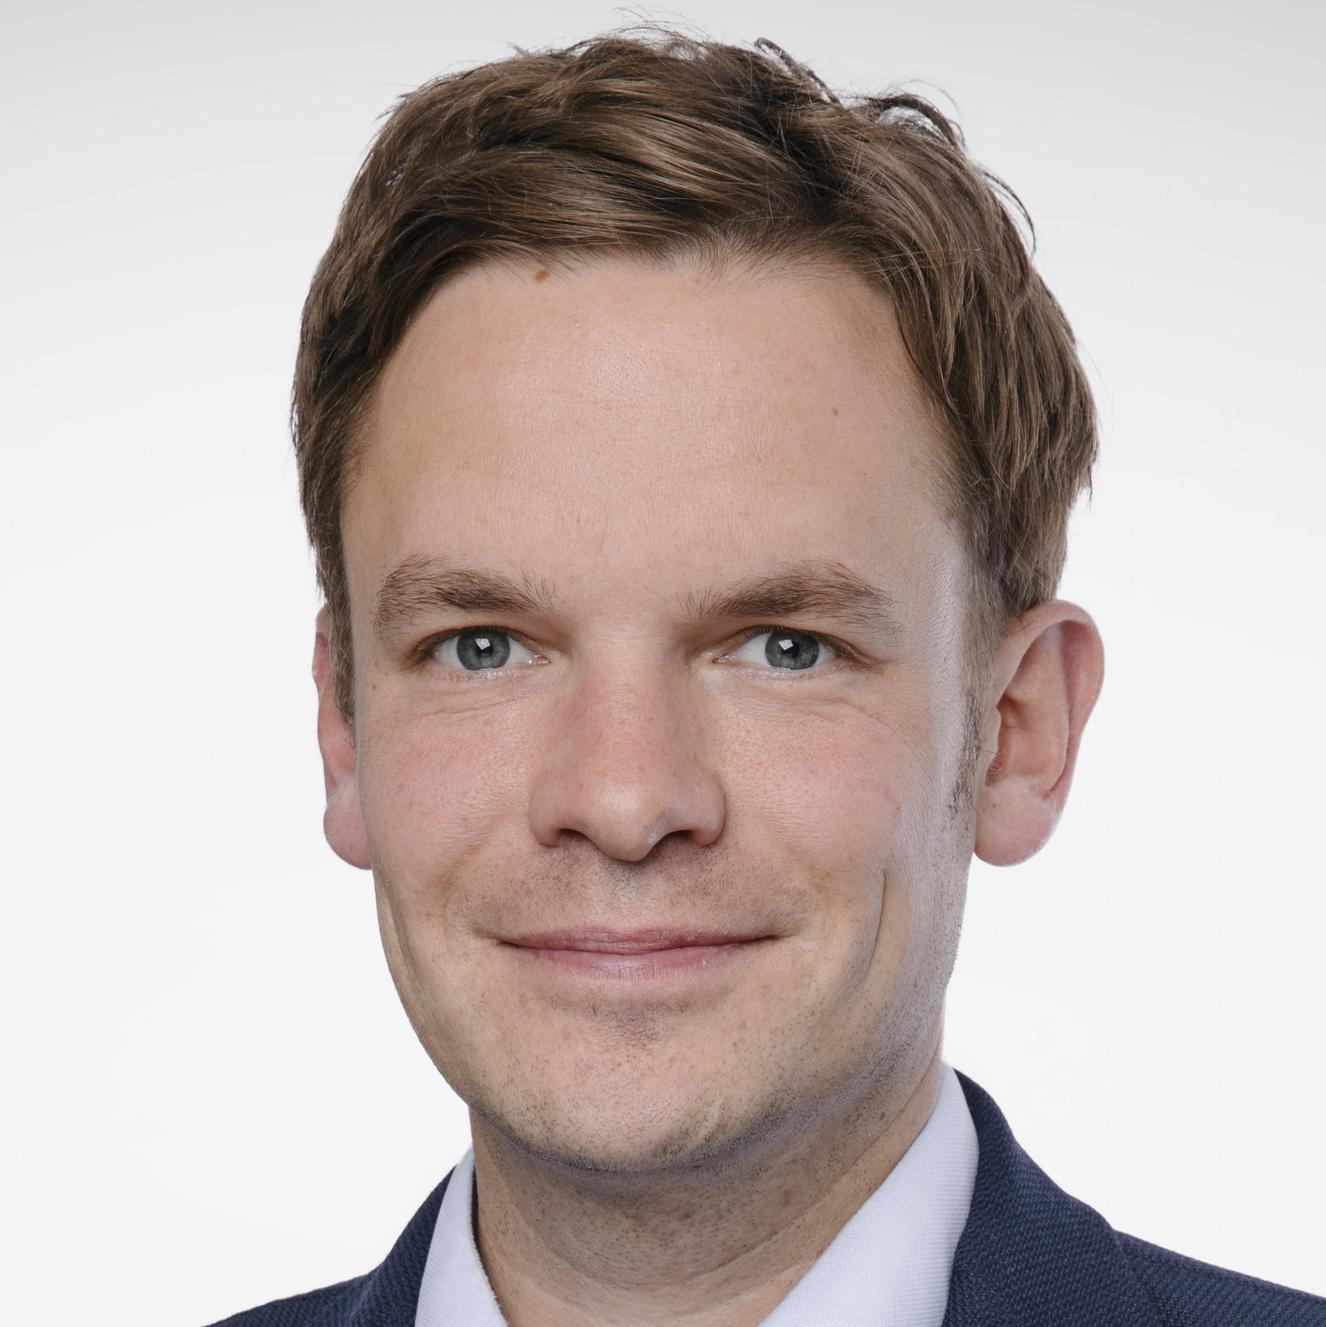 Christian Limpert